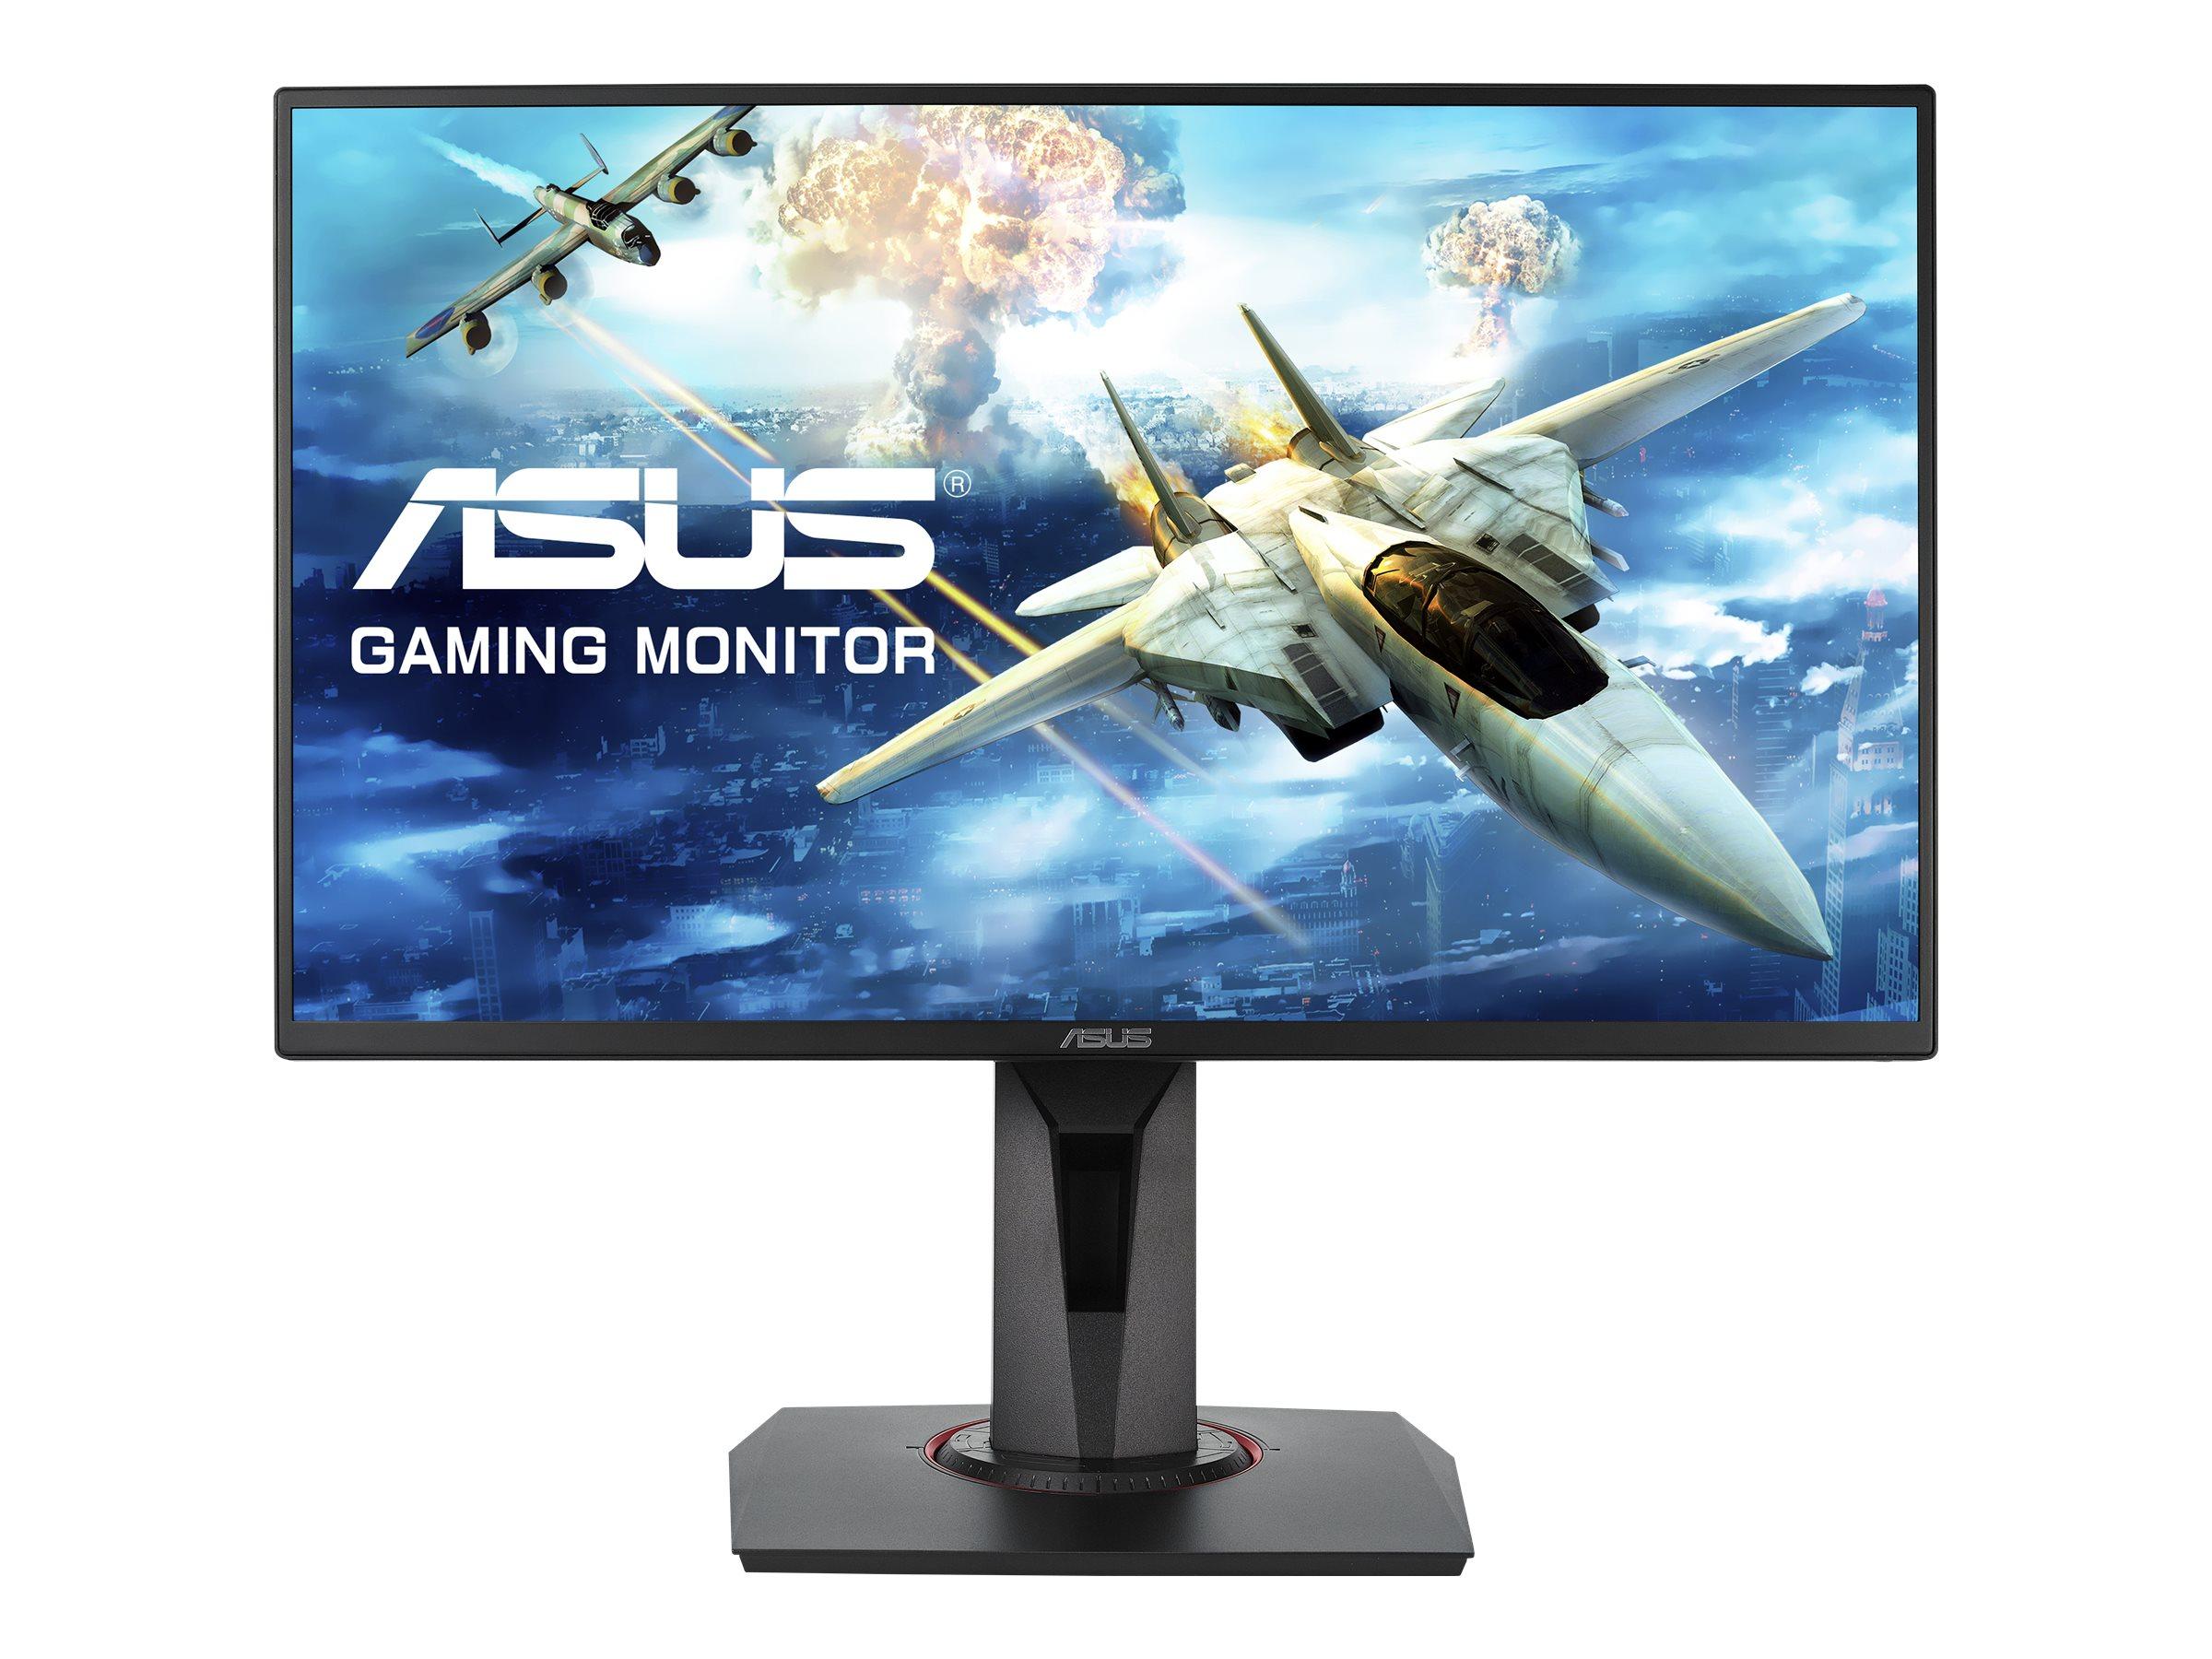 "ASUS VG258Q - LED-Monitor - 62.23 cm (24.5"") - 1920 x 1080 Full HD (1080p) TN - 400 cd/m² - 1 ms - HDMI - DVI-D - DP - Lautsprecher - Schwarz"